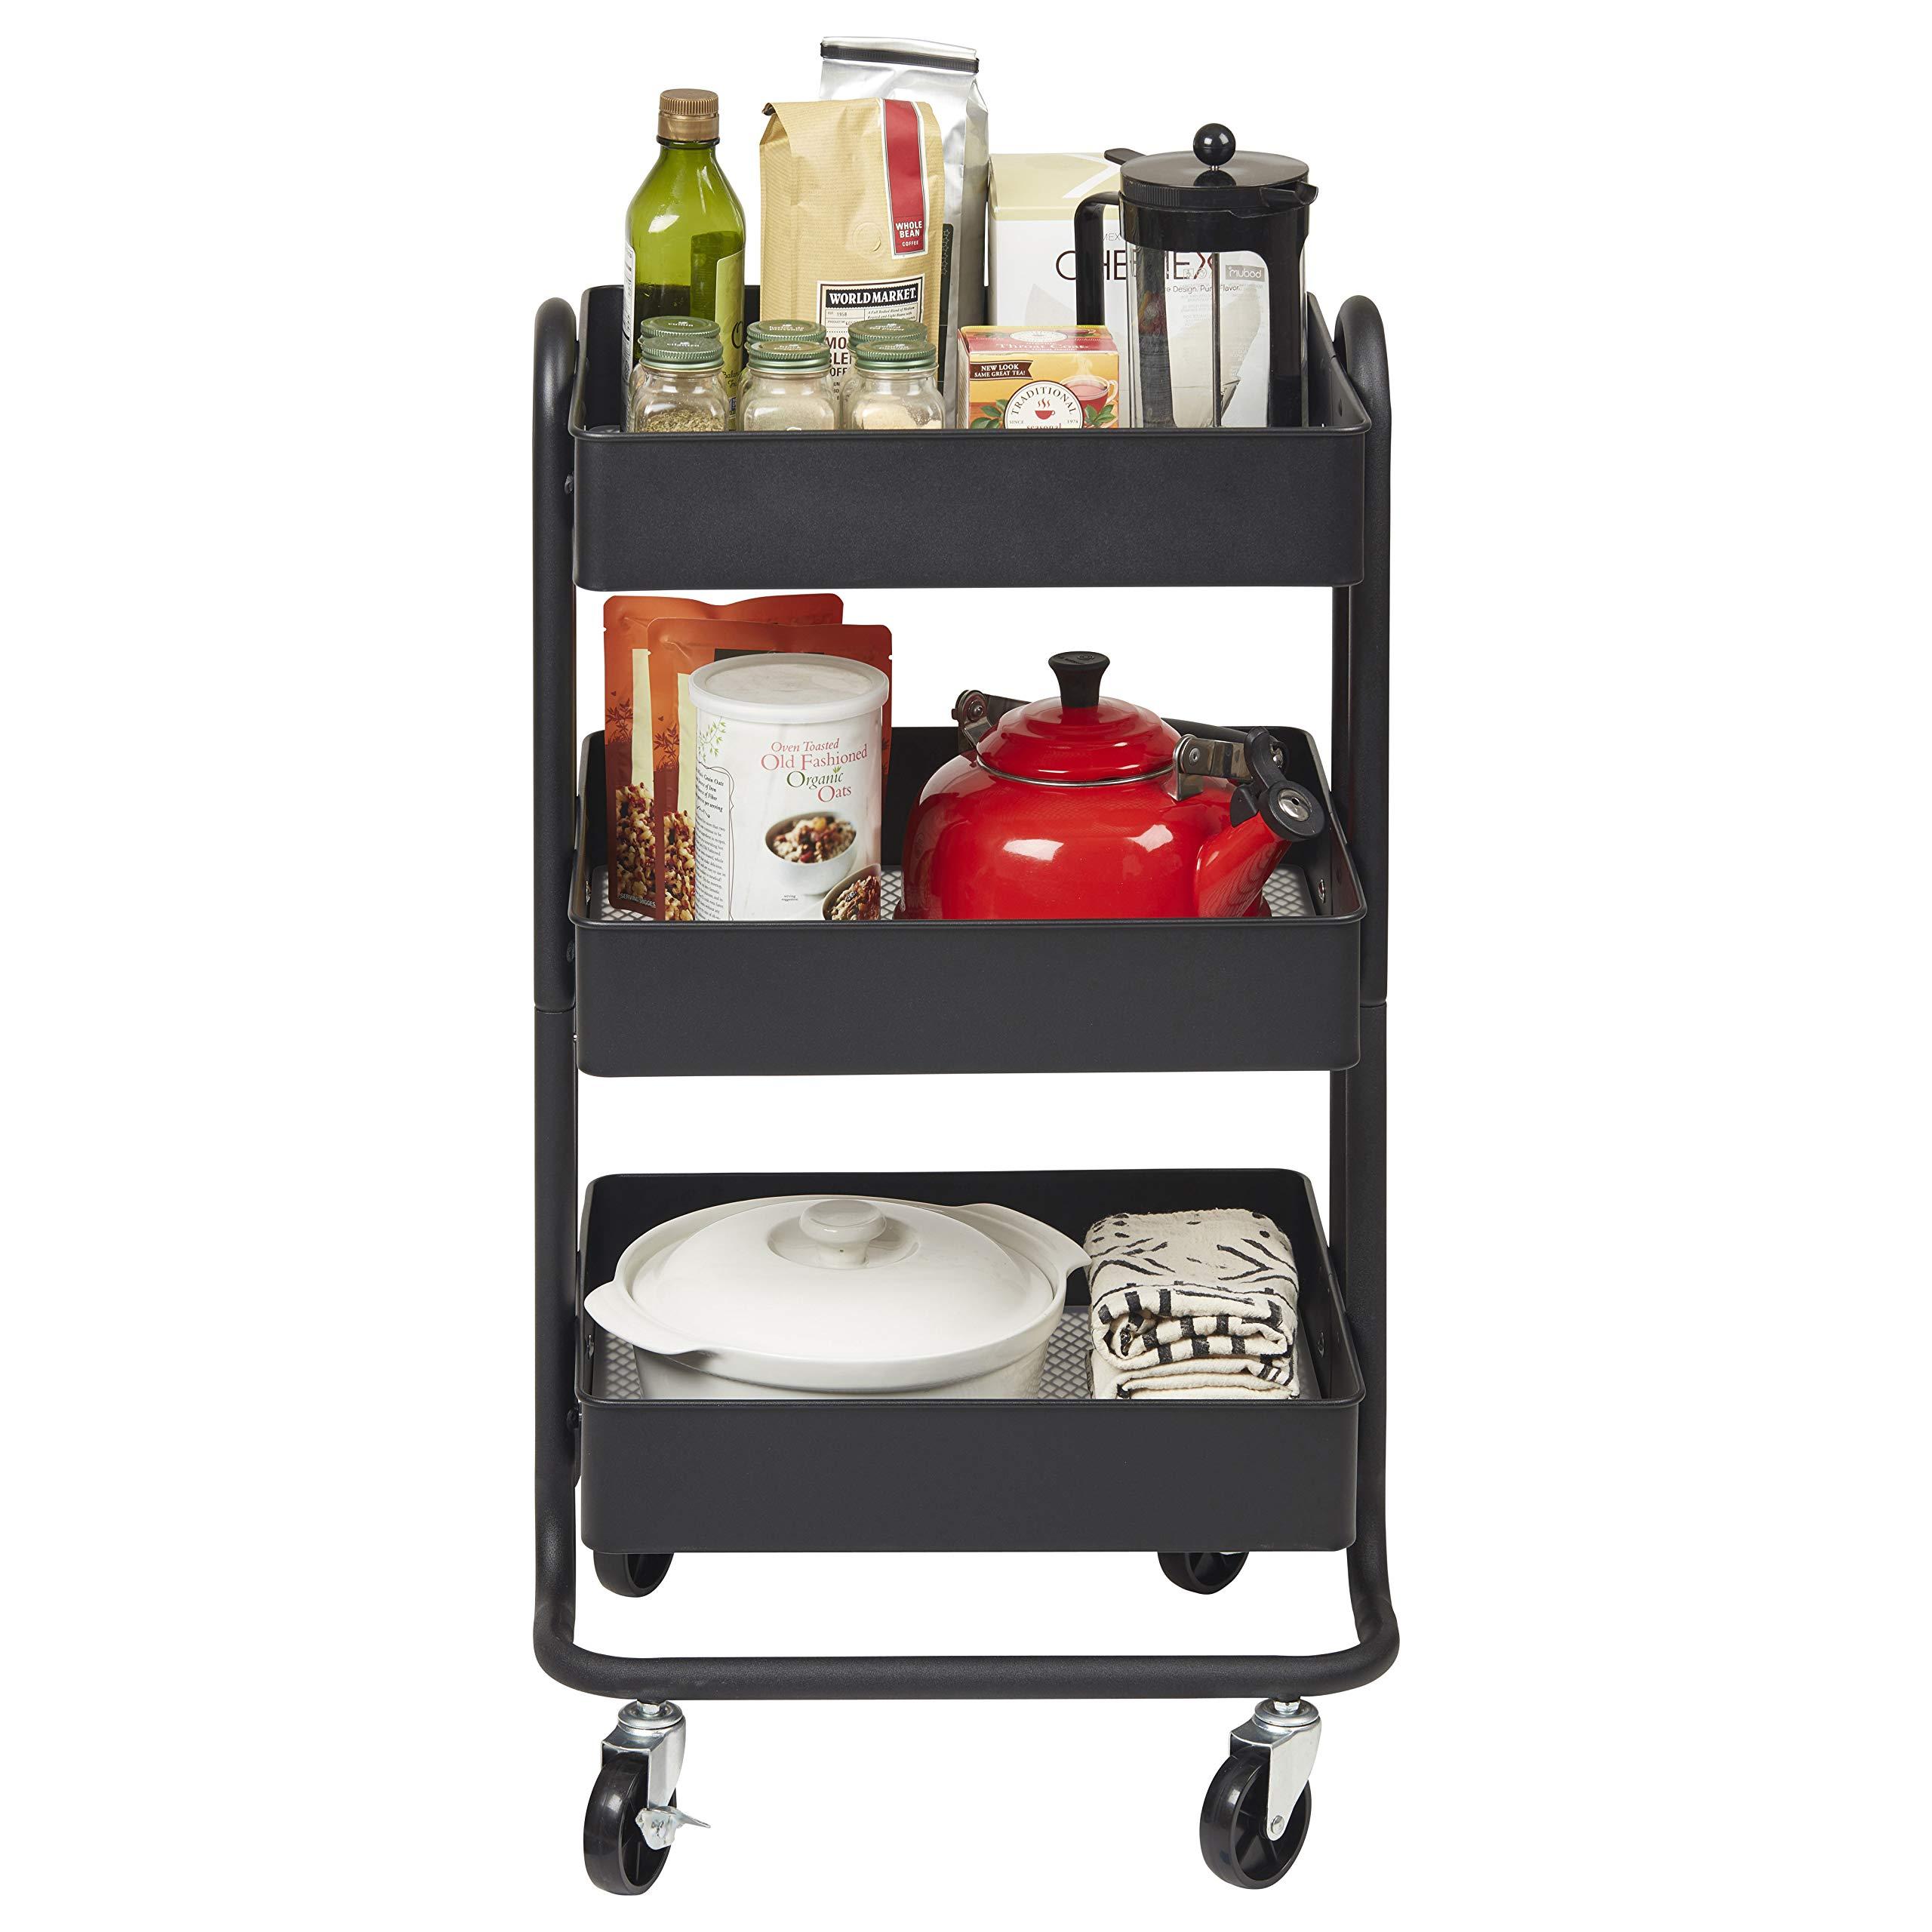 ECR4Kids 3-Tier Metal Rolling Utility Cart, Heavy-Duty Mobile Storage Organizer With Casters, Office Organization, Kitchen Storage, Classroom Cart, Beauty Cart, Coffee Cart, Mobile Library Cart by ECR4Kids